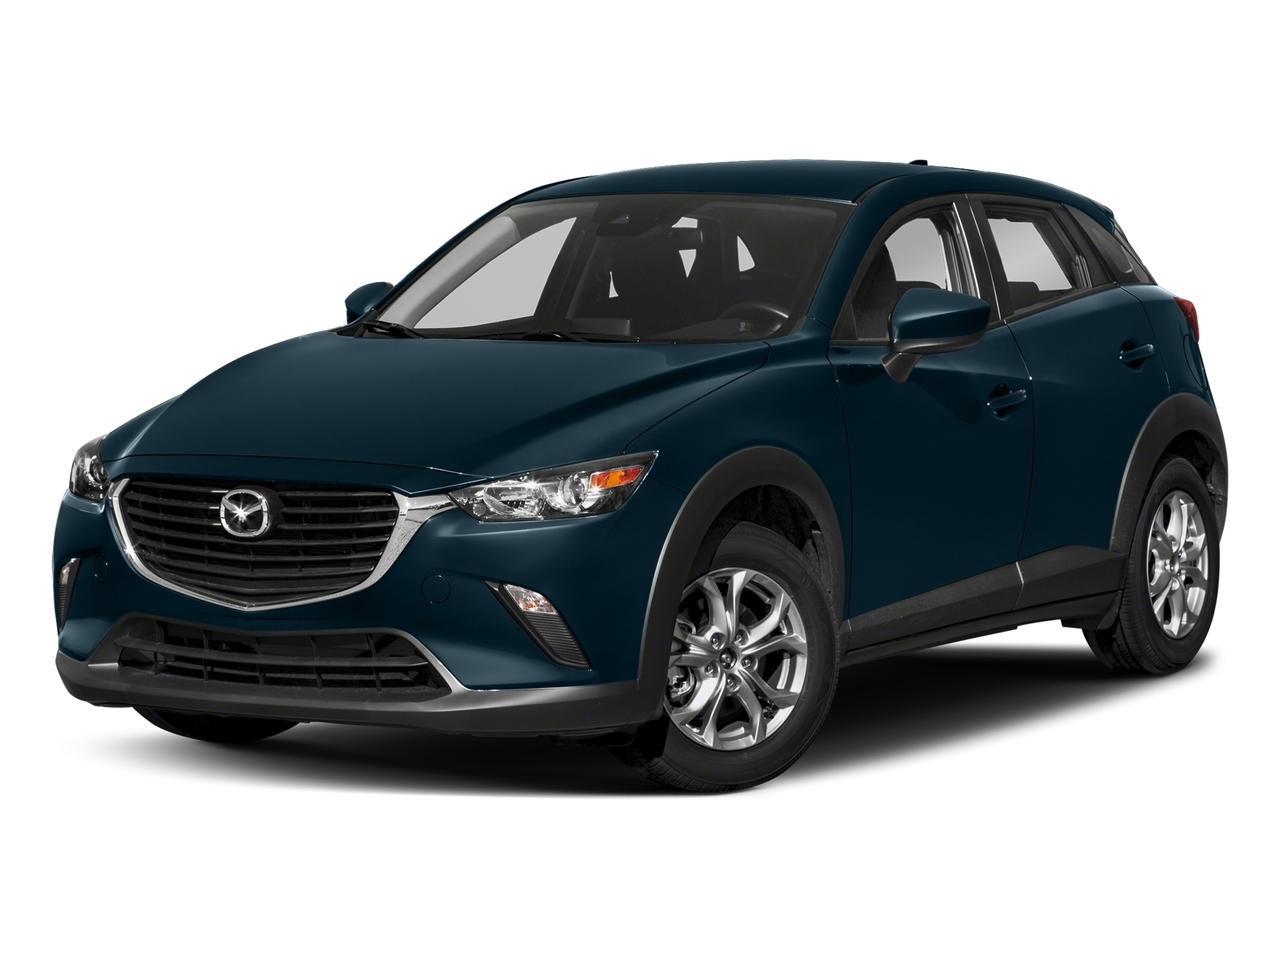 2018 Mazda CX-3 Vehicle Photo in Trevose, PA 19053